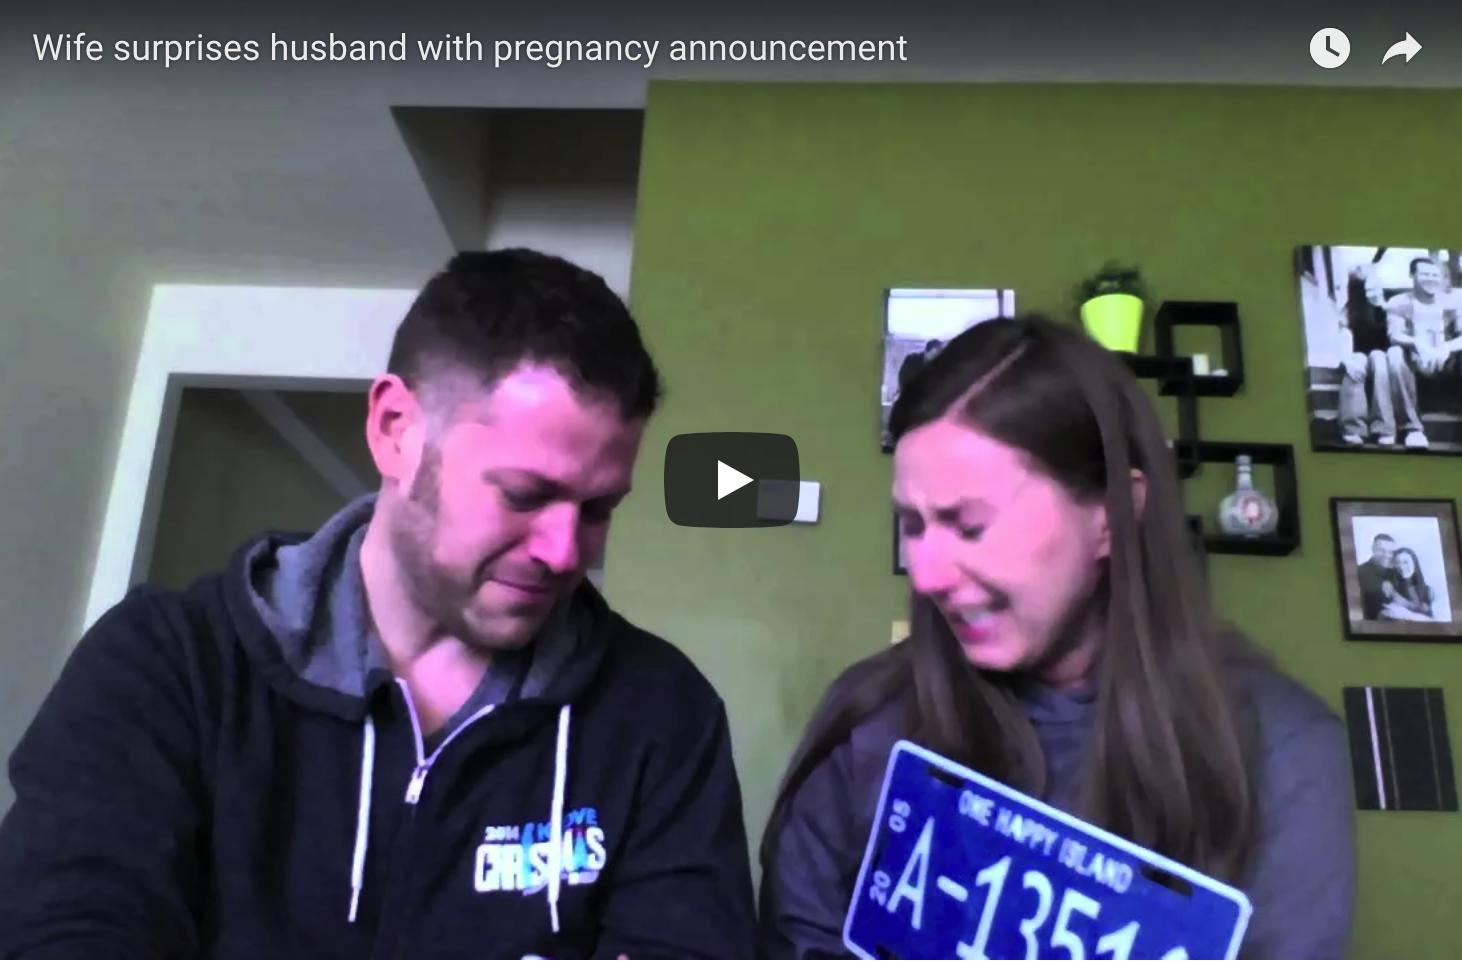 Viral Pregnancy Announcement Videos